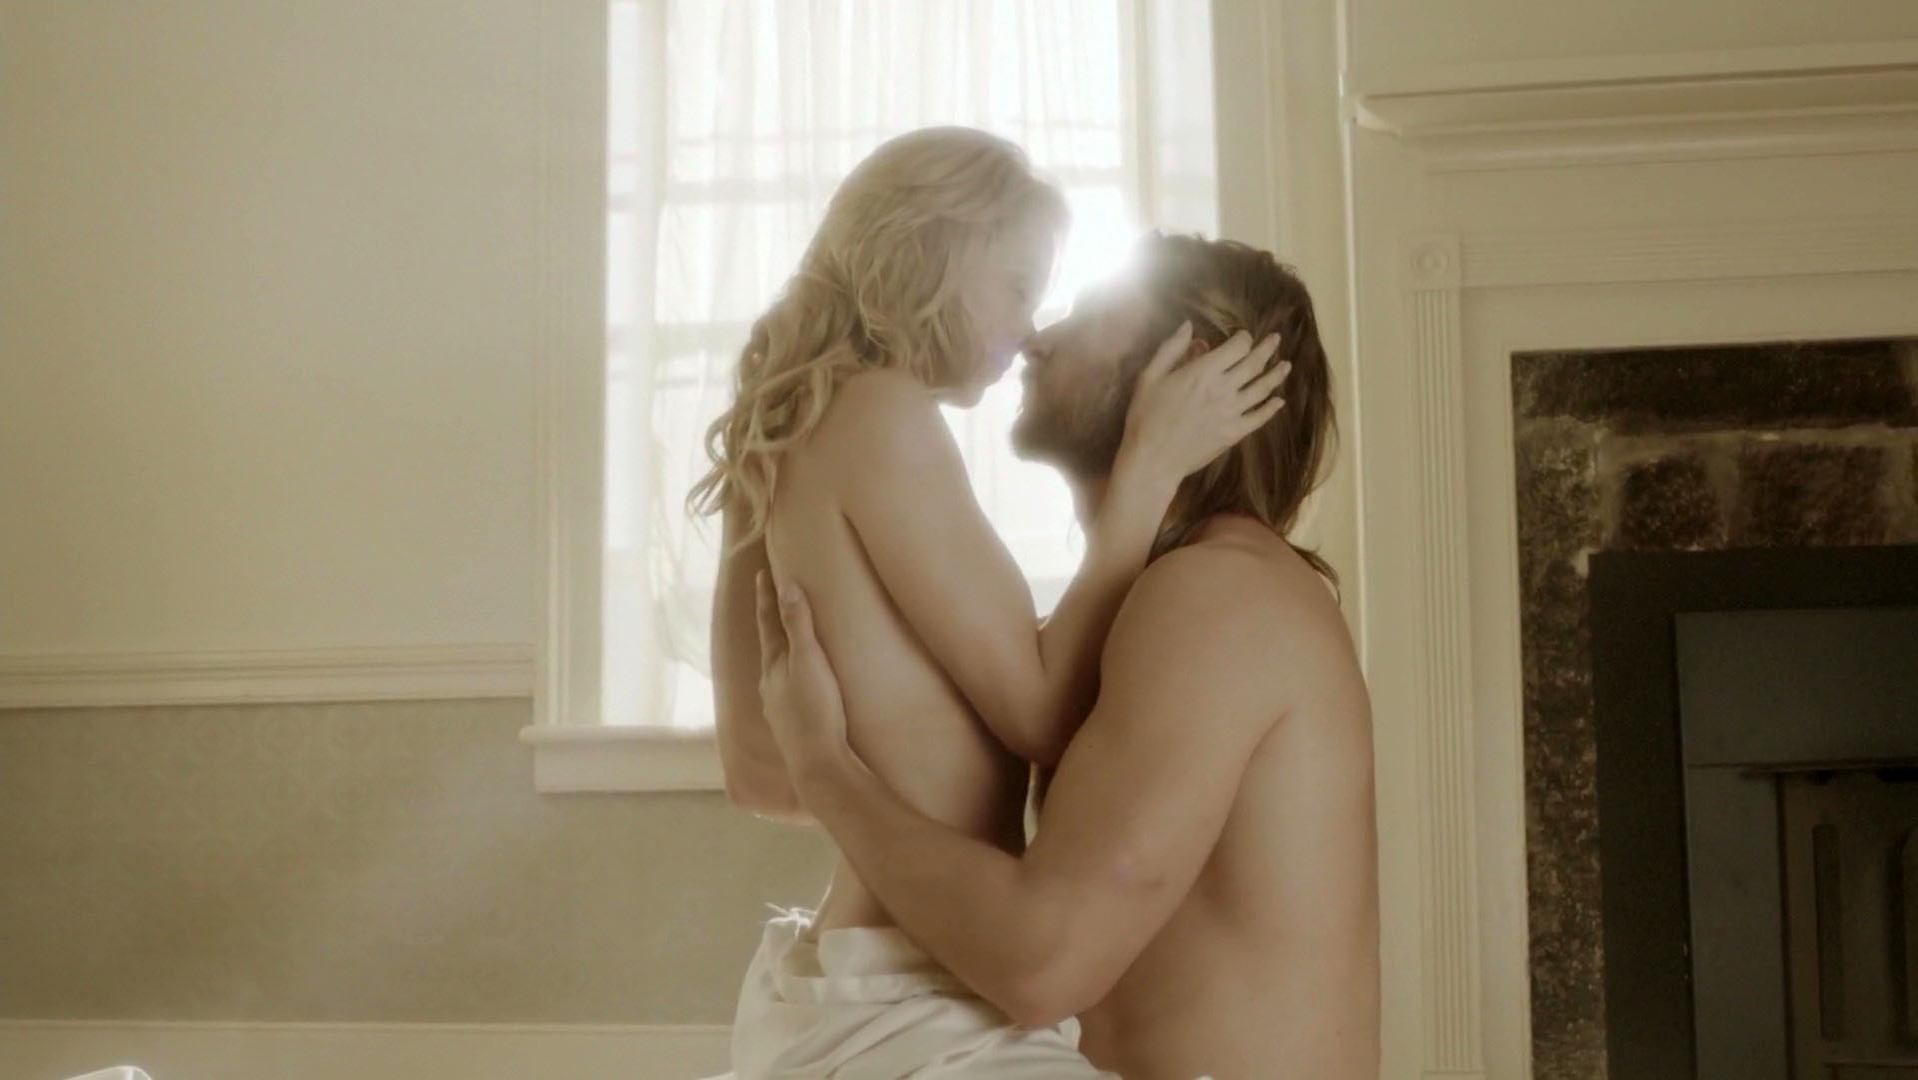 ebony porn old fashion love scene free movie